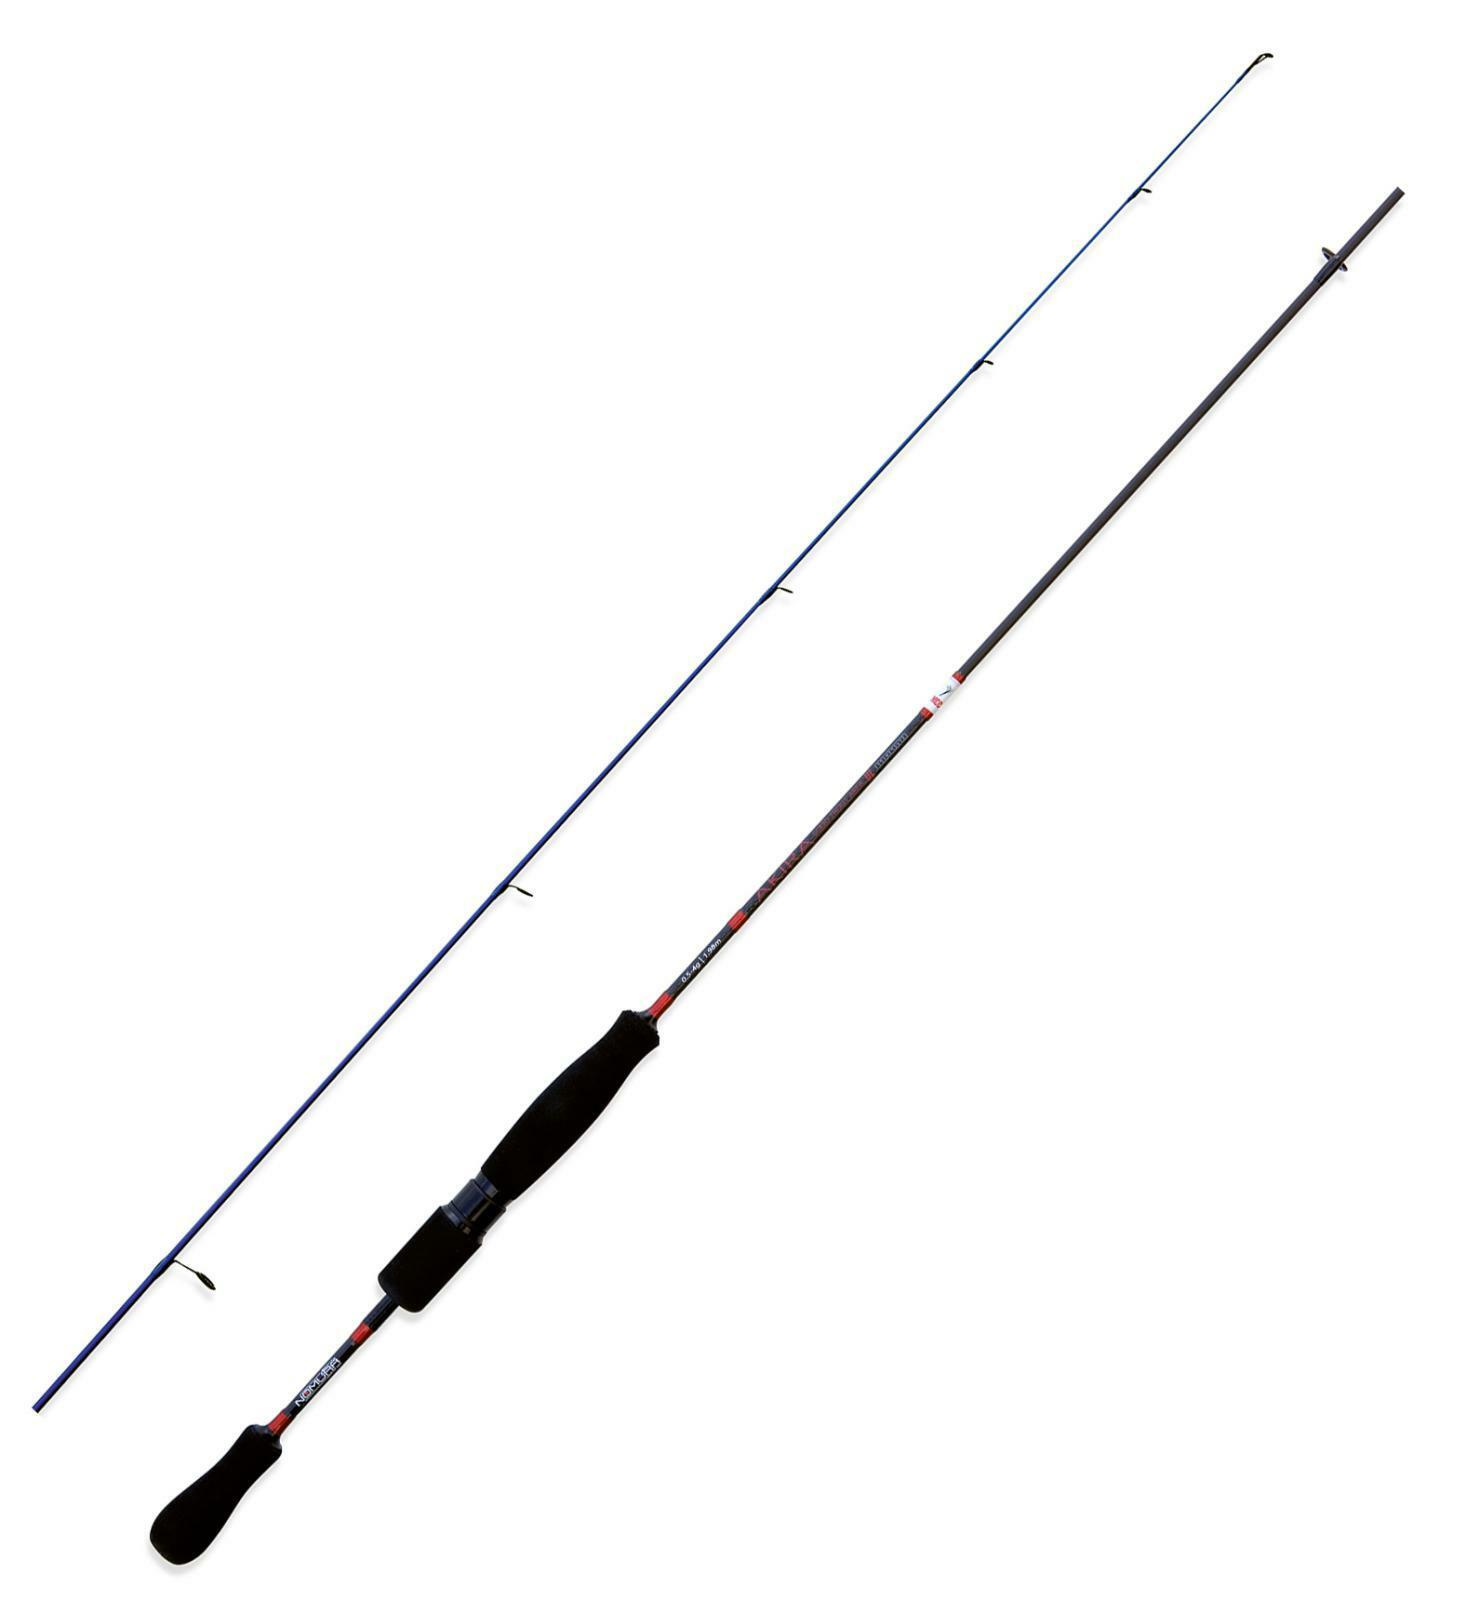 NM20520417 Nomura Canna pesca Trout Area Akira Solid 1,70cm  0,5-4 gr     CAS